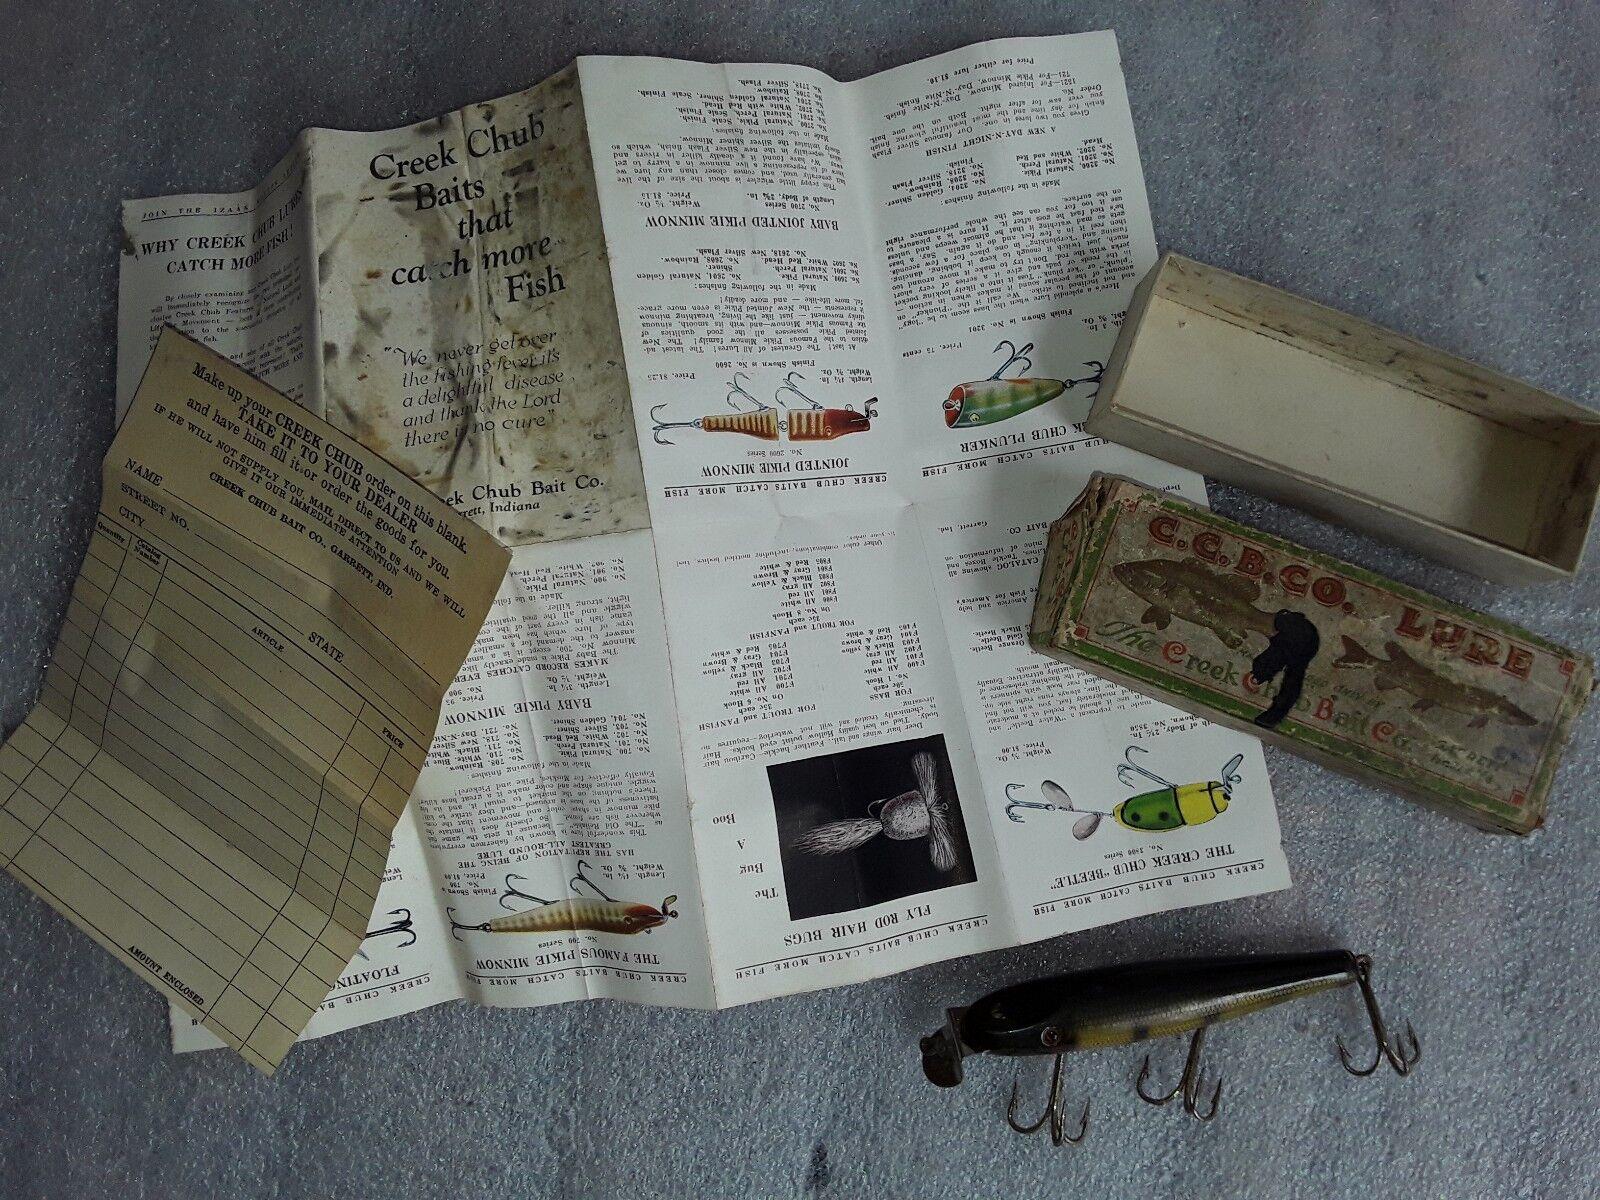 Vintage wood body CREEK CHUB PIKIE MINNOW PERCH FISHING LURE W  BOX & PAPERWORK